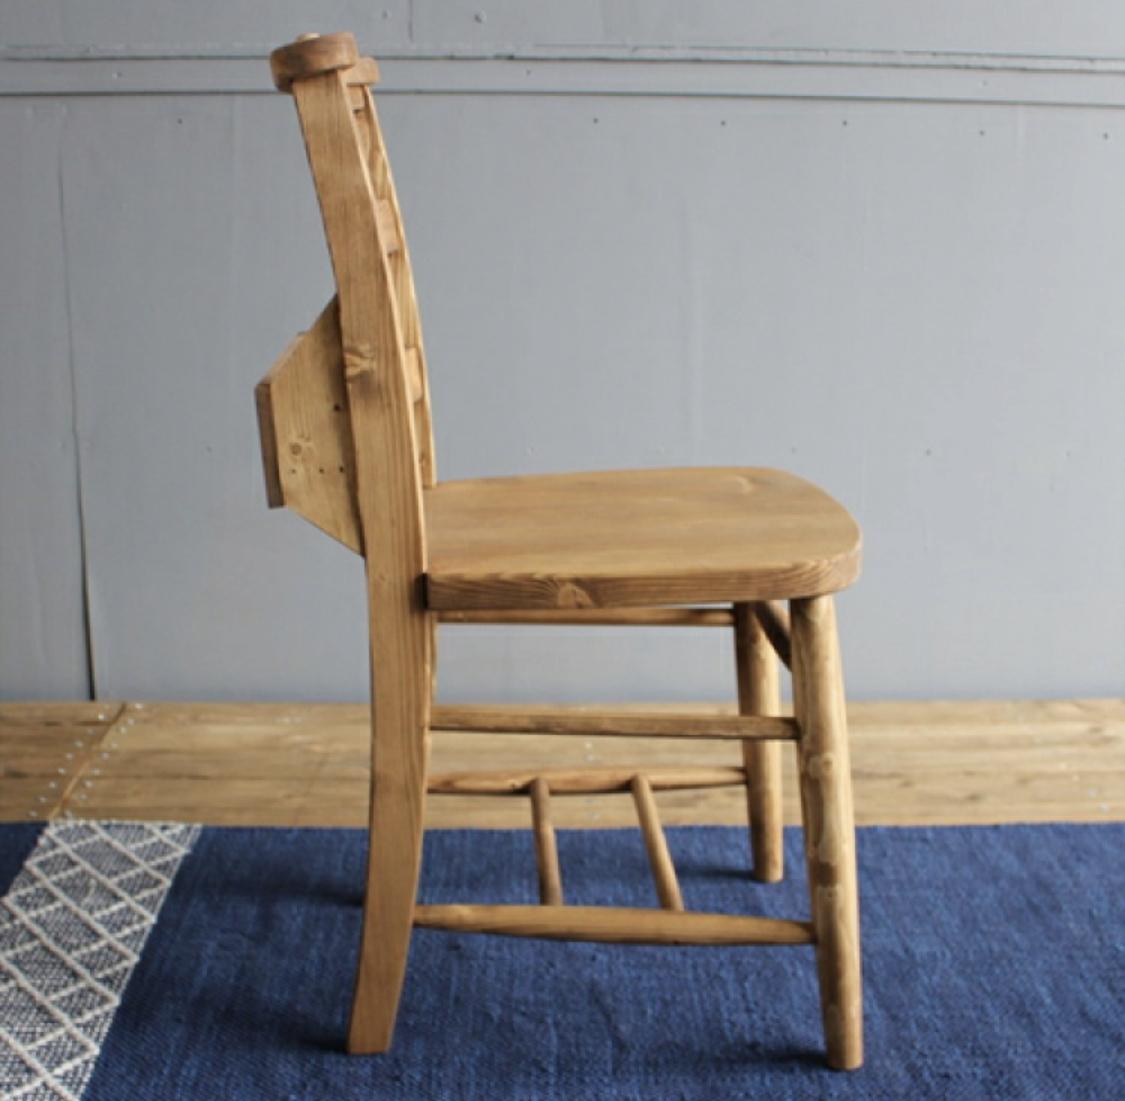 PINE Dining Chair /2Chair Set / カントリースタイル